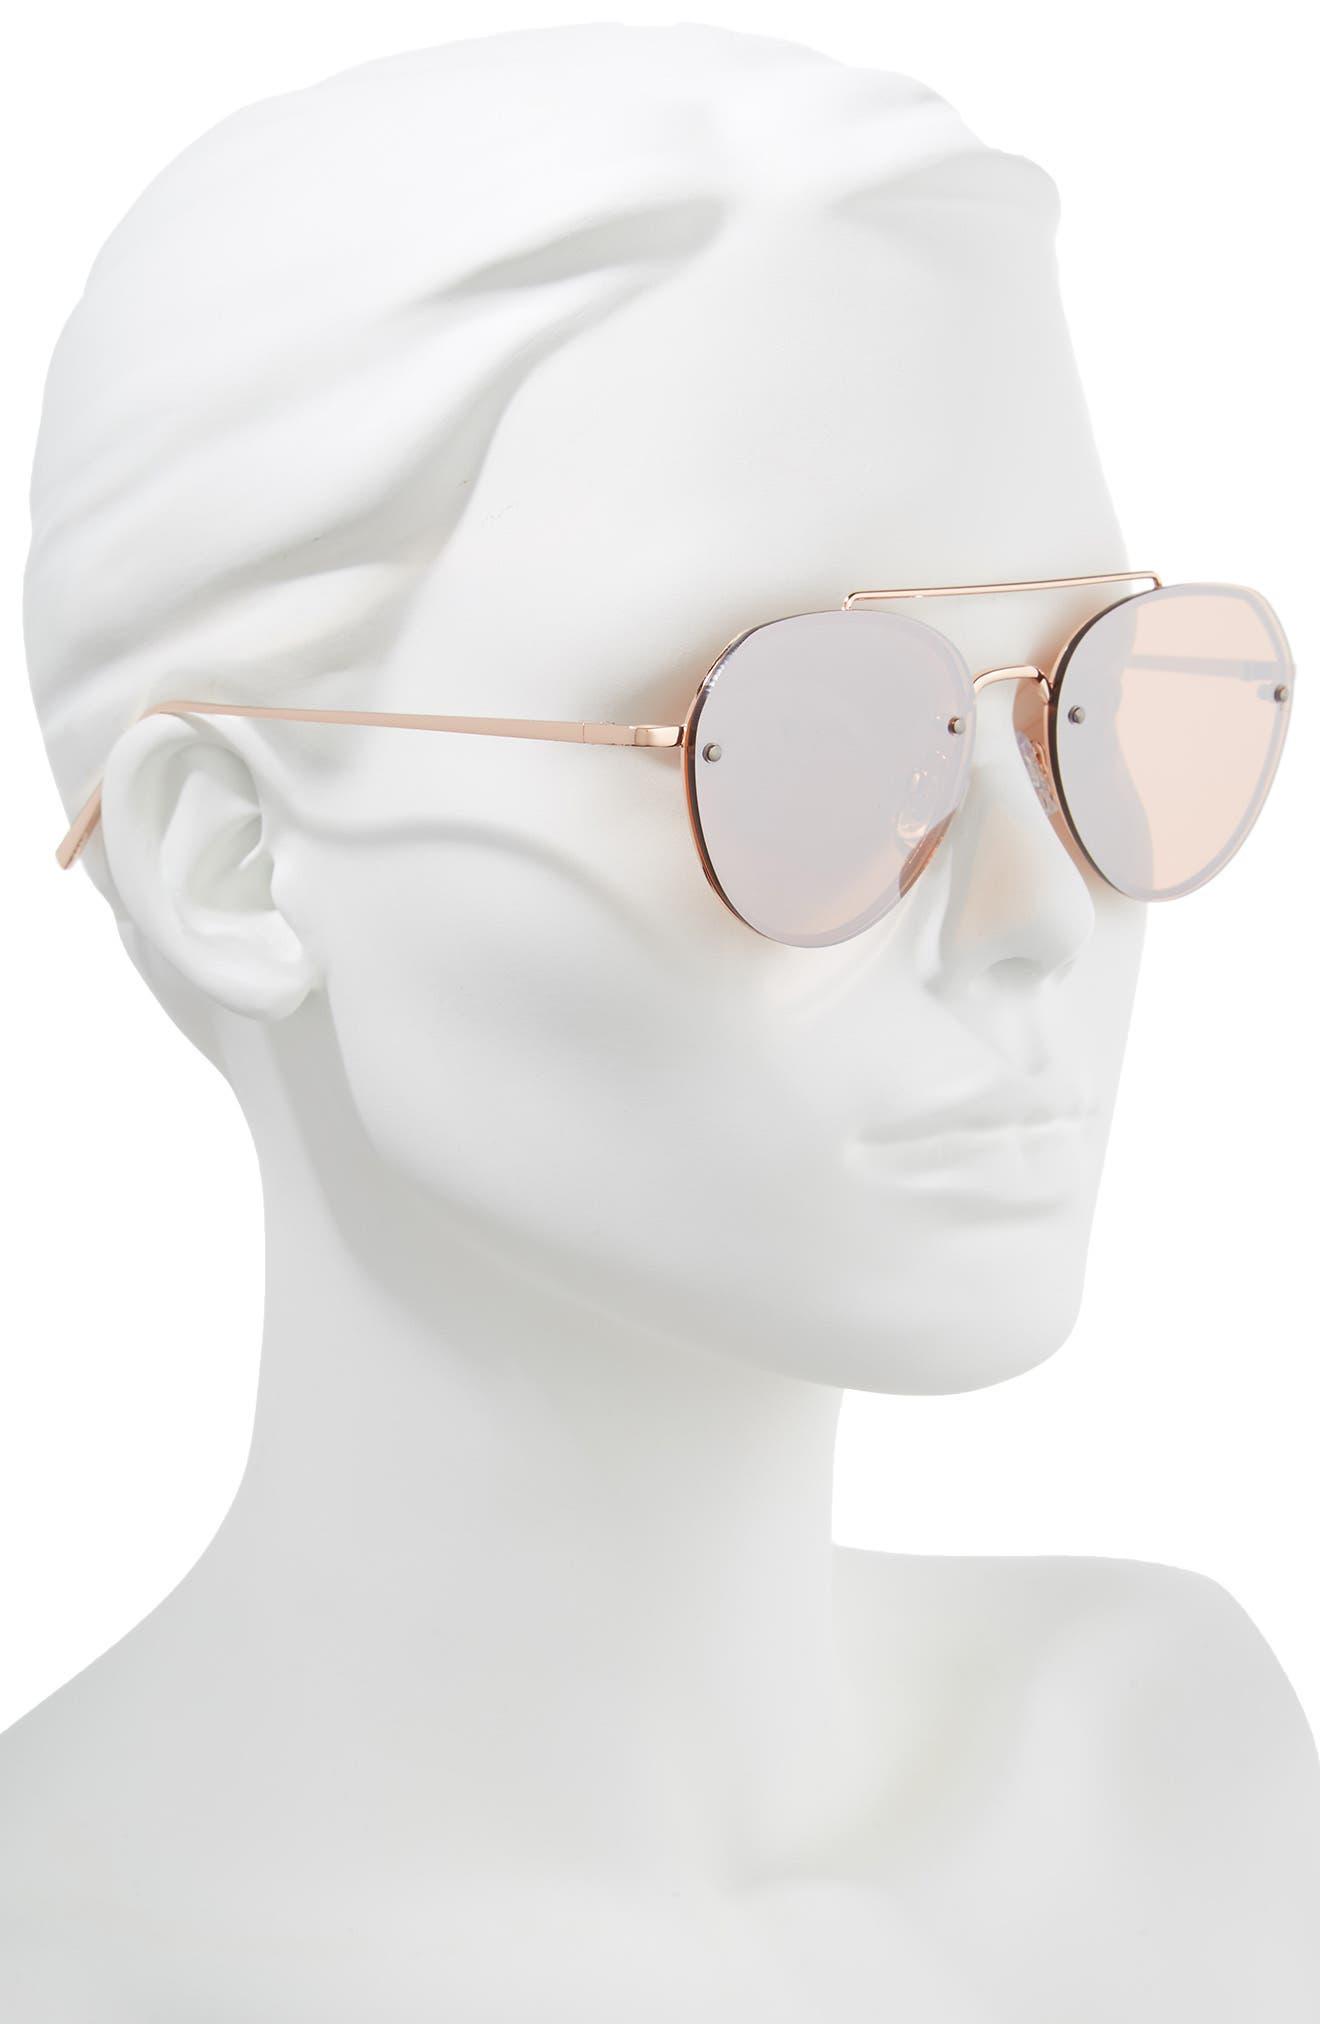 Gradient Petite Aviator Sunglasses,                             Alternate thumbnail 2, color,                             ROSE / GOLD